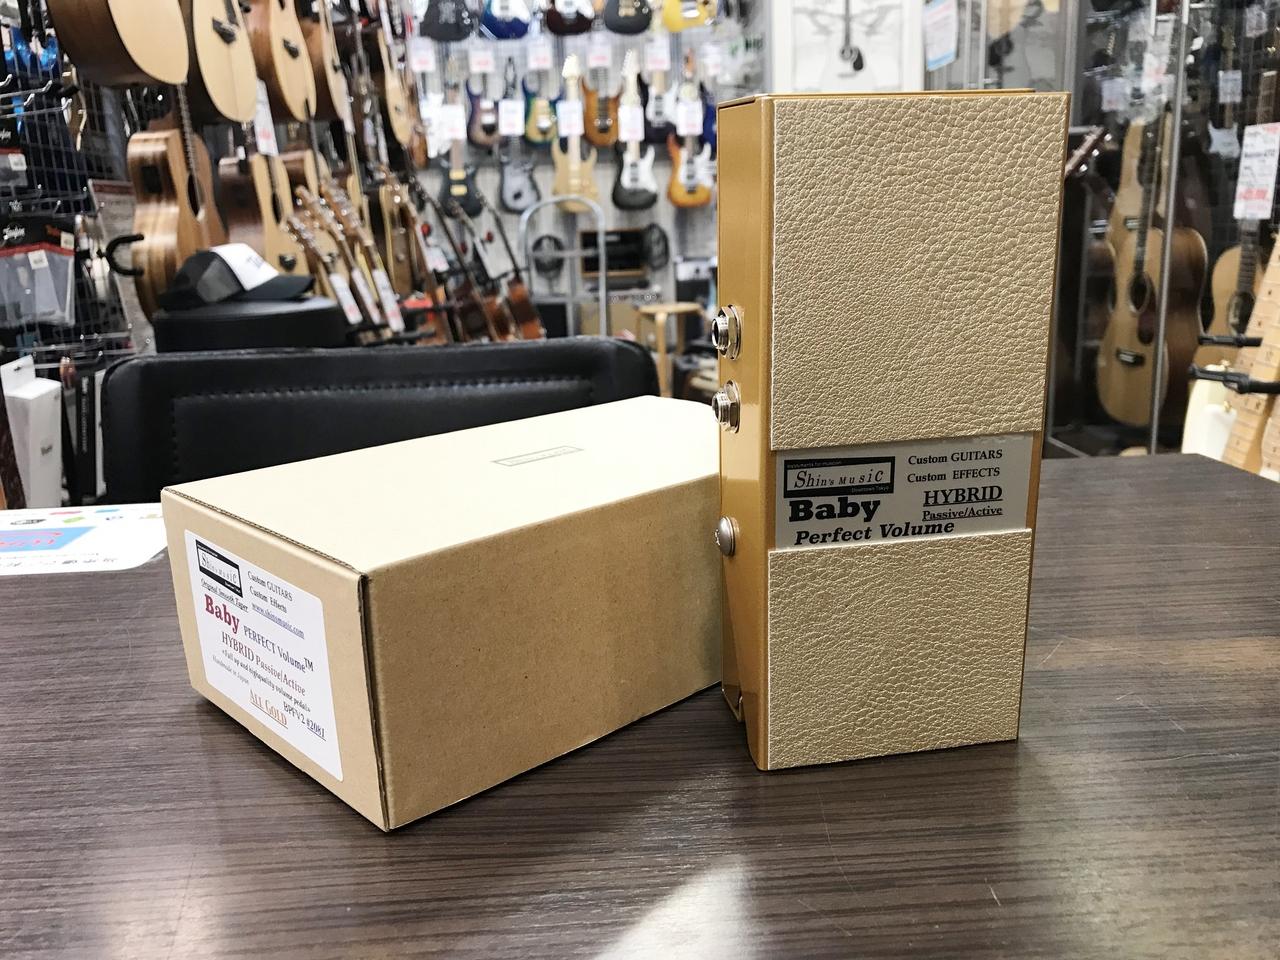 Shin's Music Baby Perfect Volume Hybrid Passive / Active BPFV2 All Gold [custom model] [volume pedal]